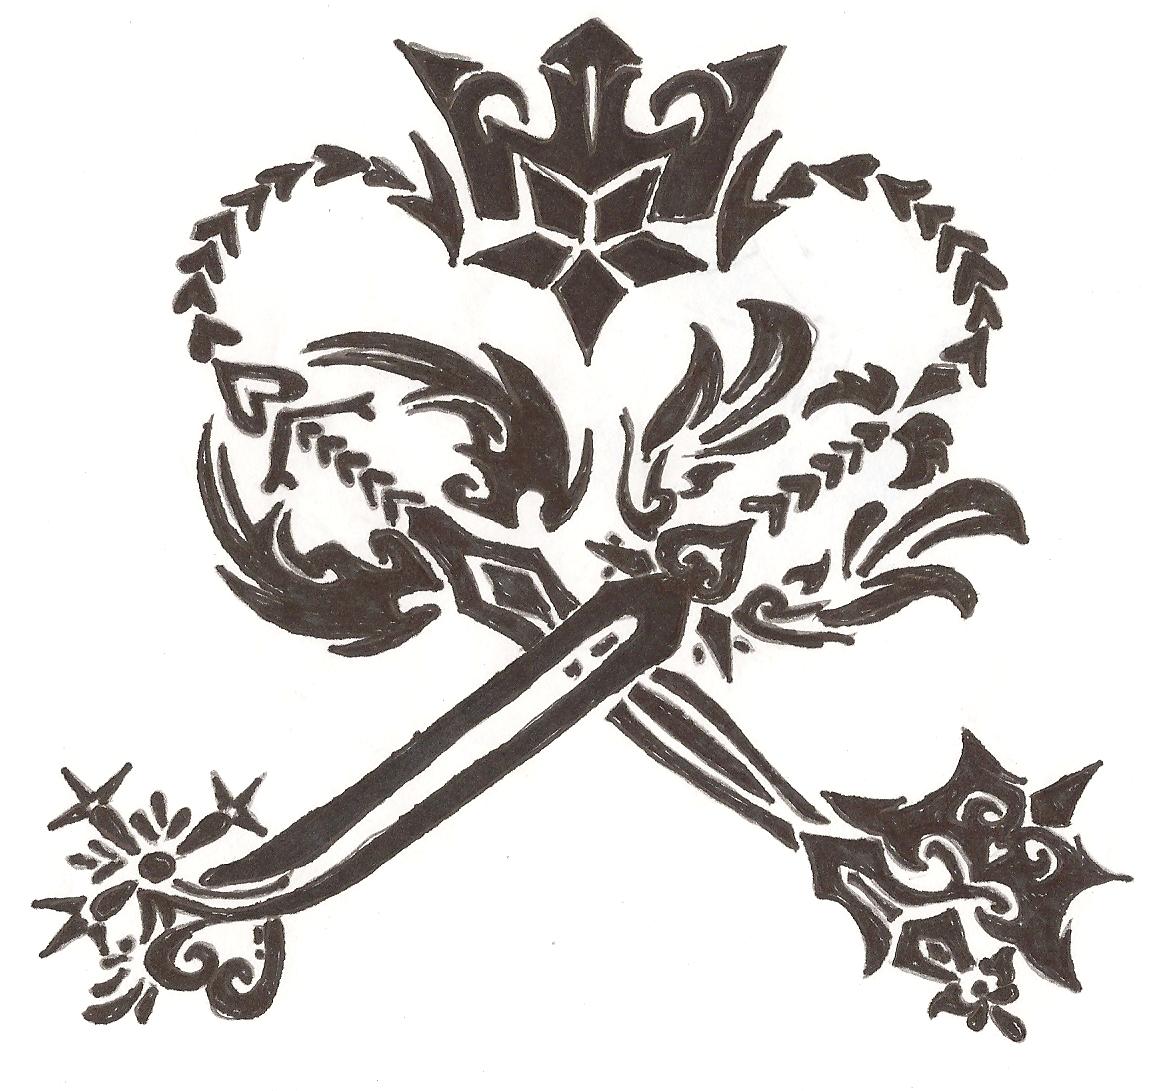 oblivion and oathkeeper tattoo by itsROXASxiii on DeviantArt